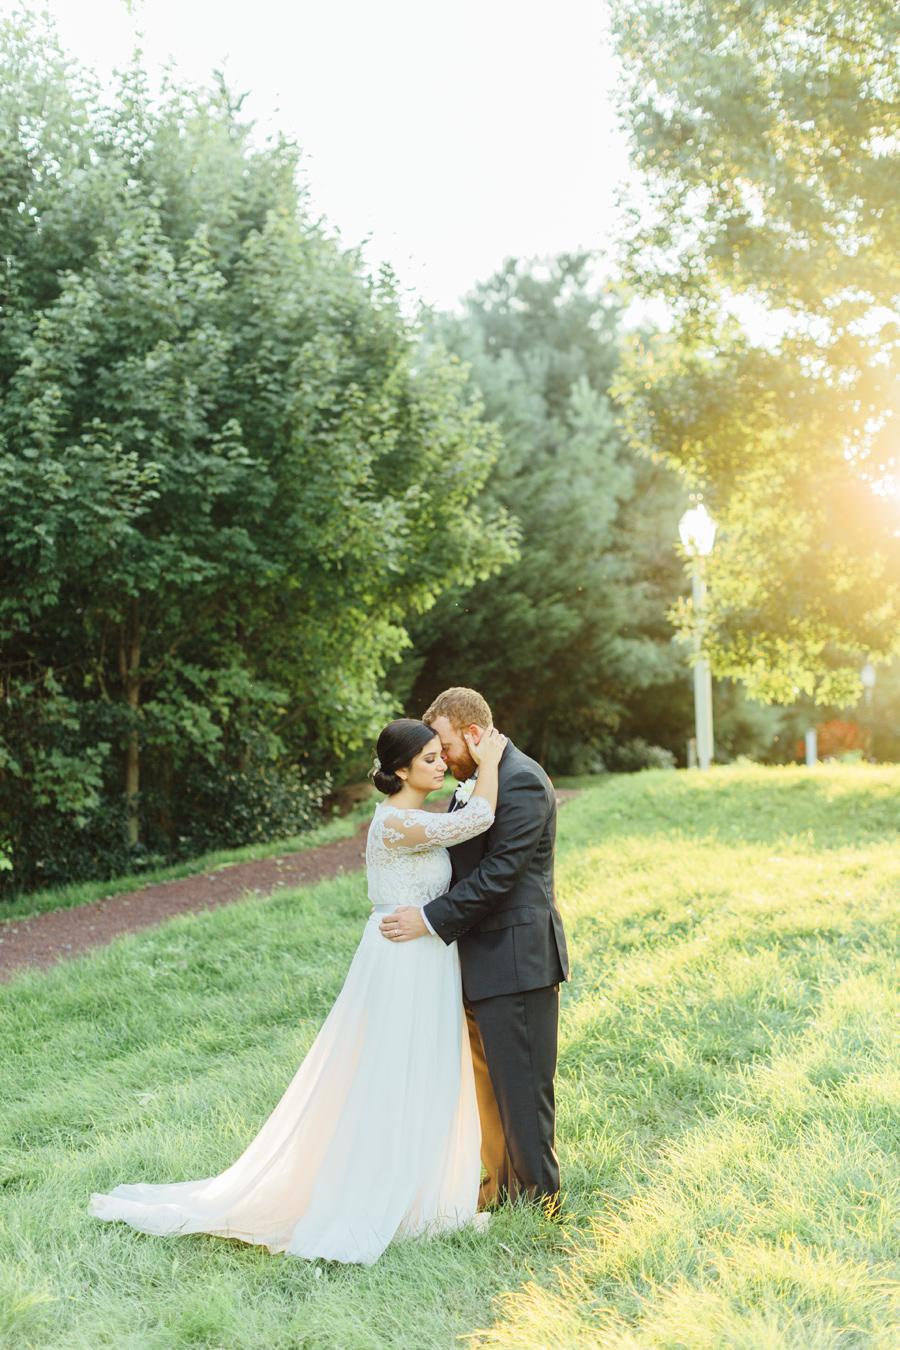 the-inn-at-leola-wedding-lancaster-pennsylvania-wedding-photographer-rebeka-viola-photograhy (80).jpg